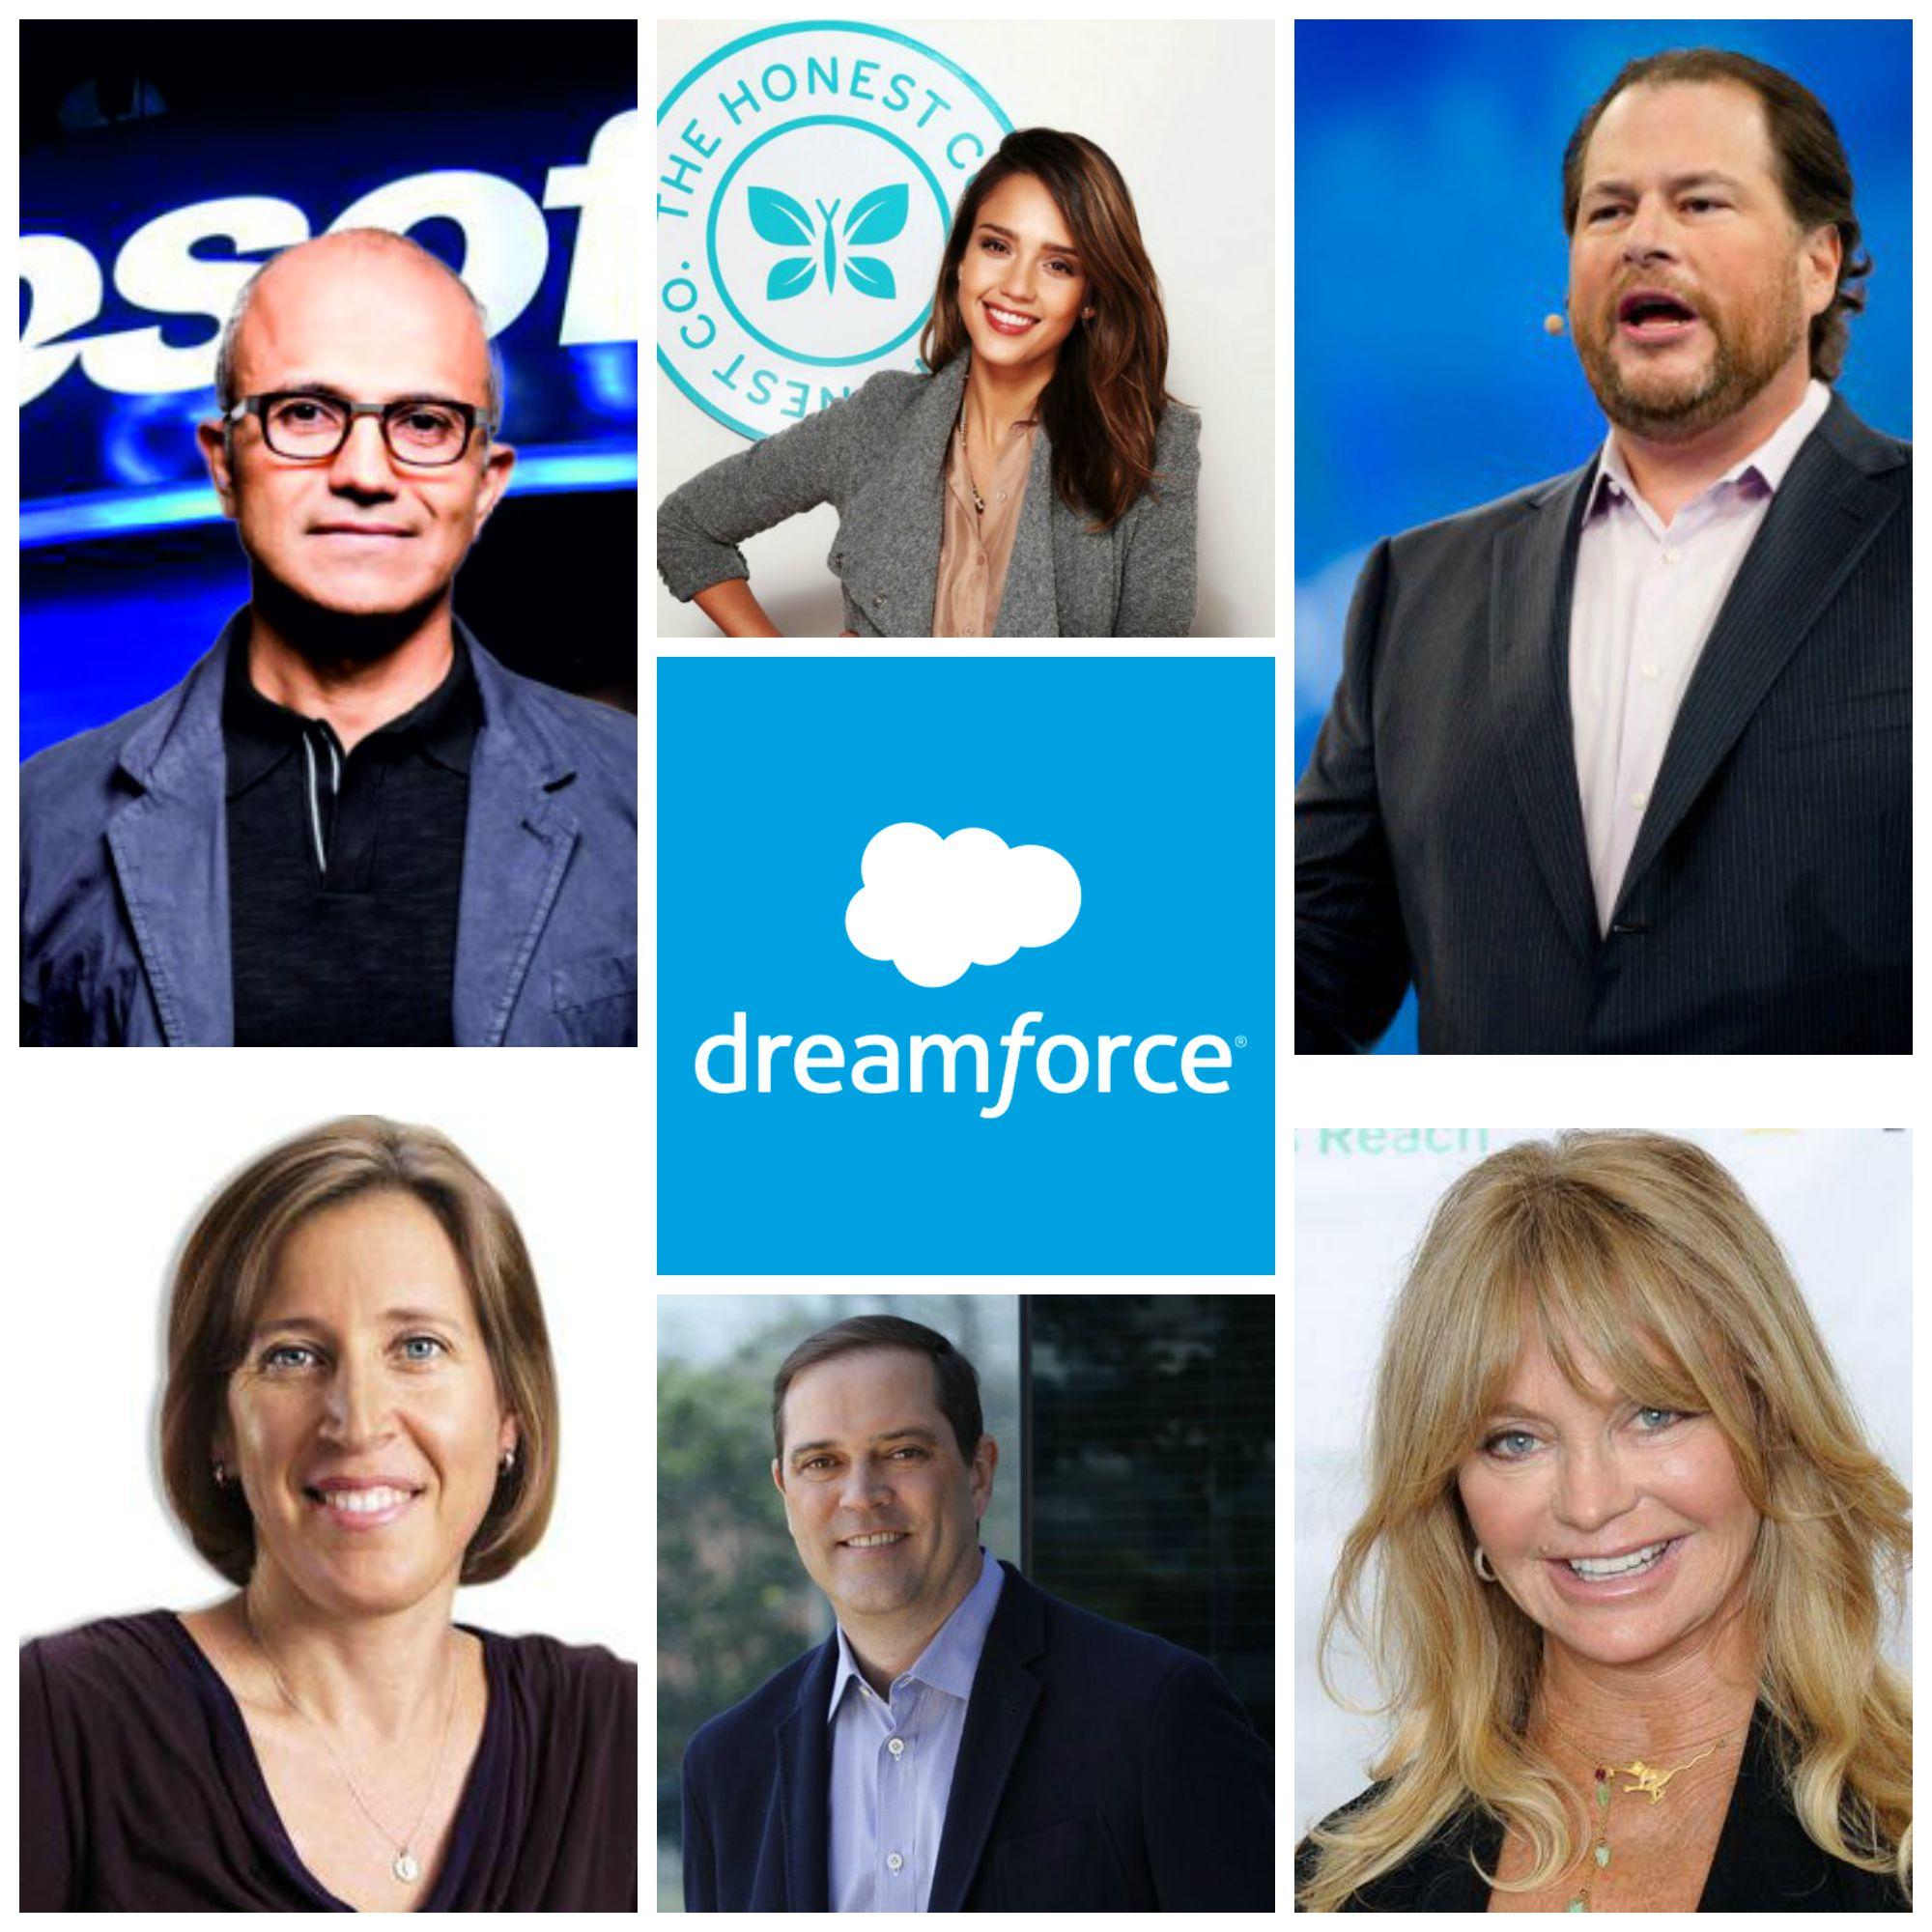 Dreamforce 2015 Keynotes